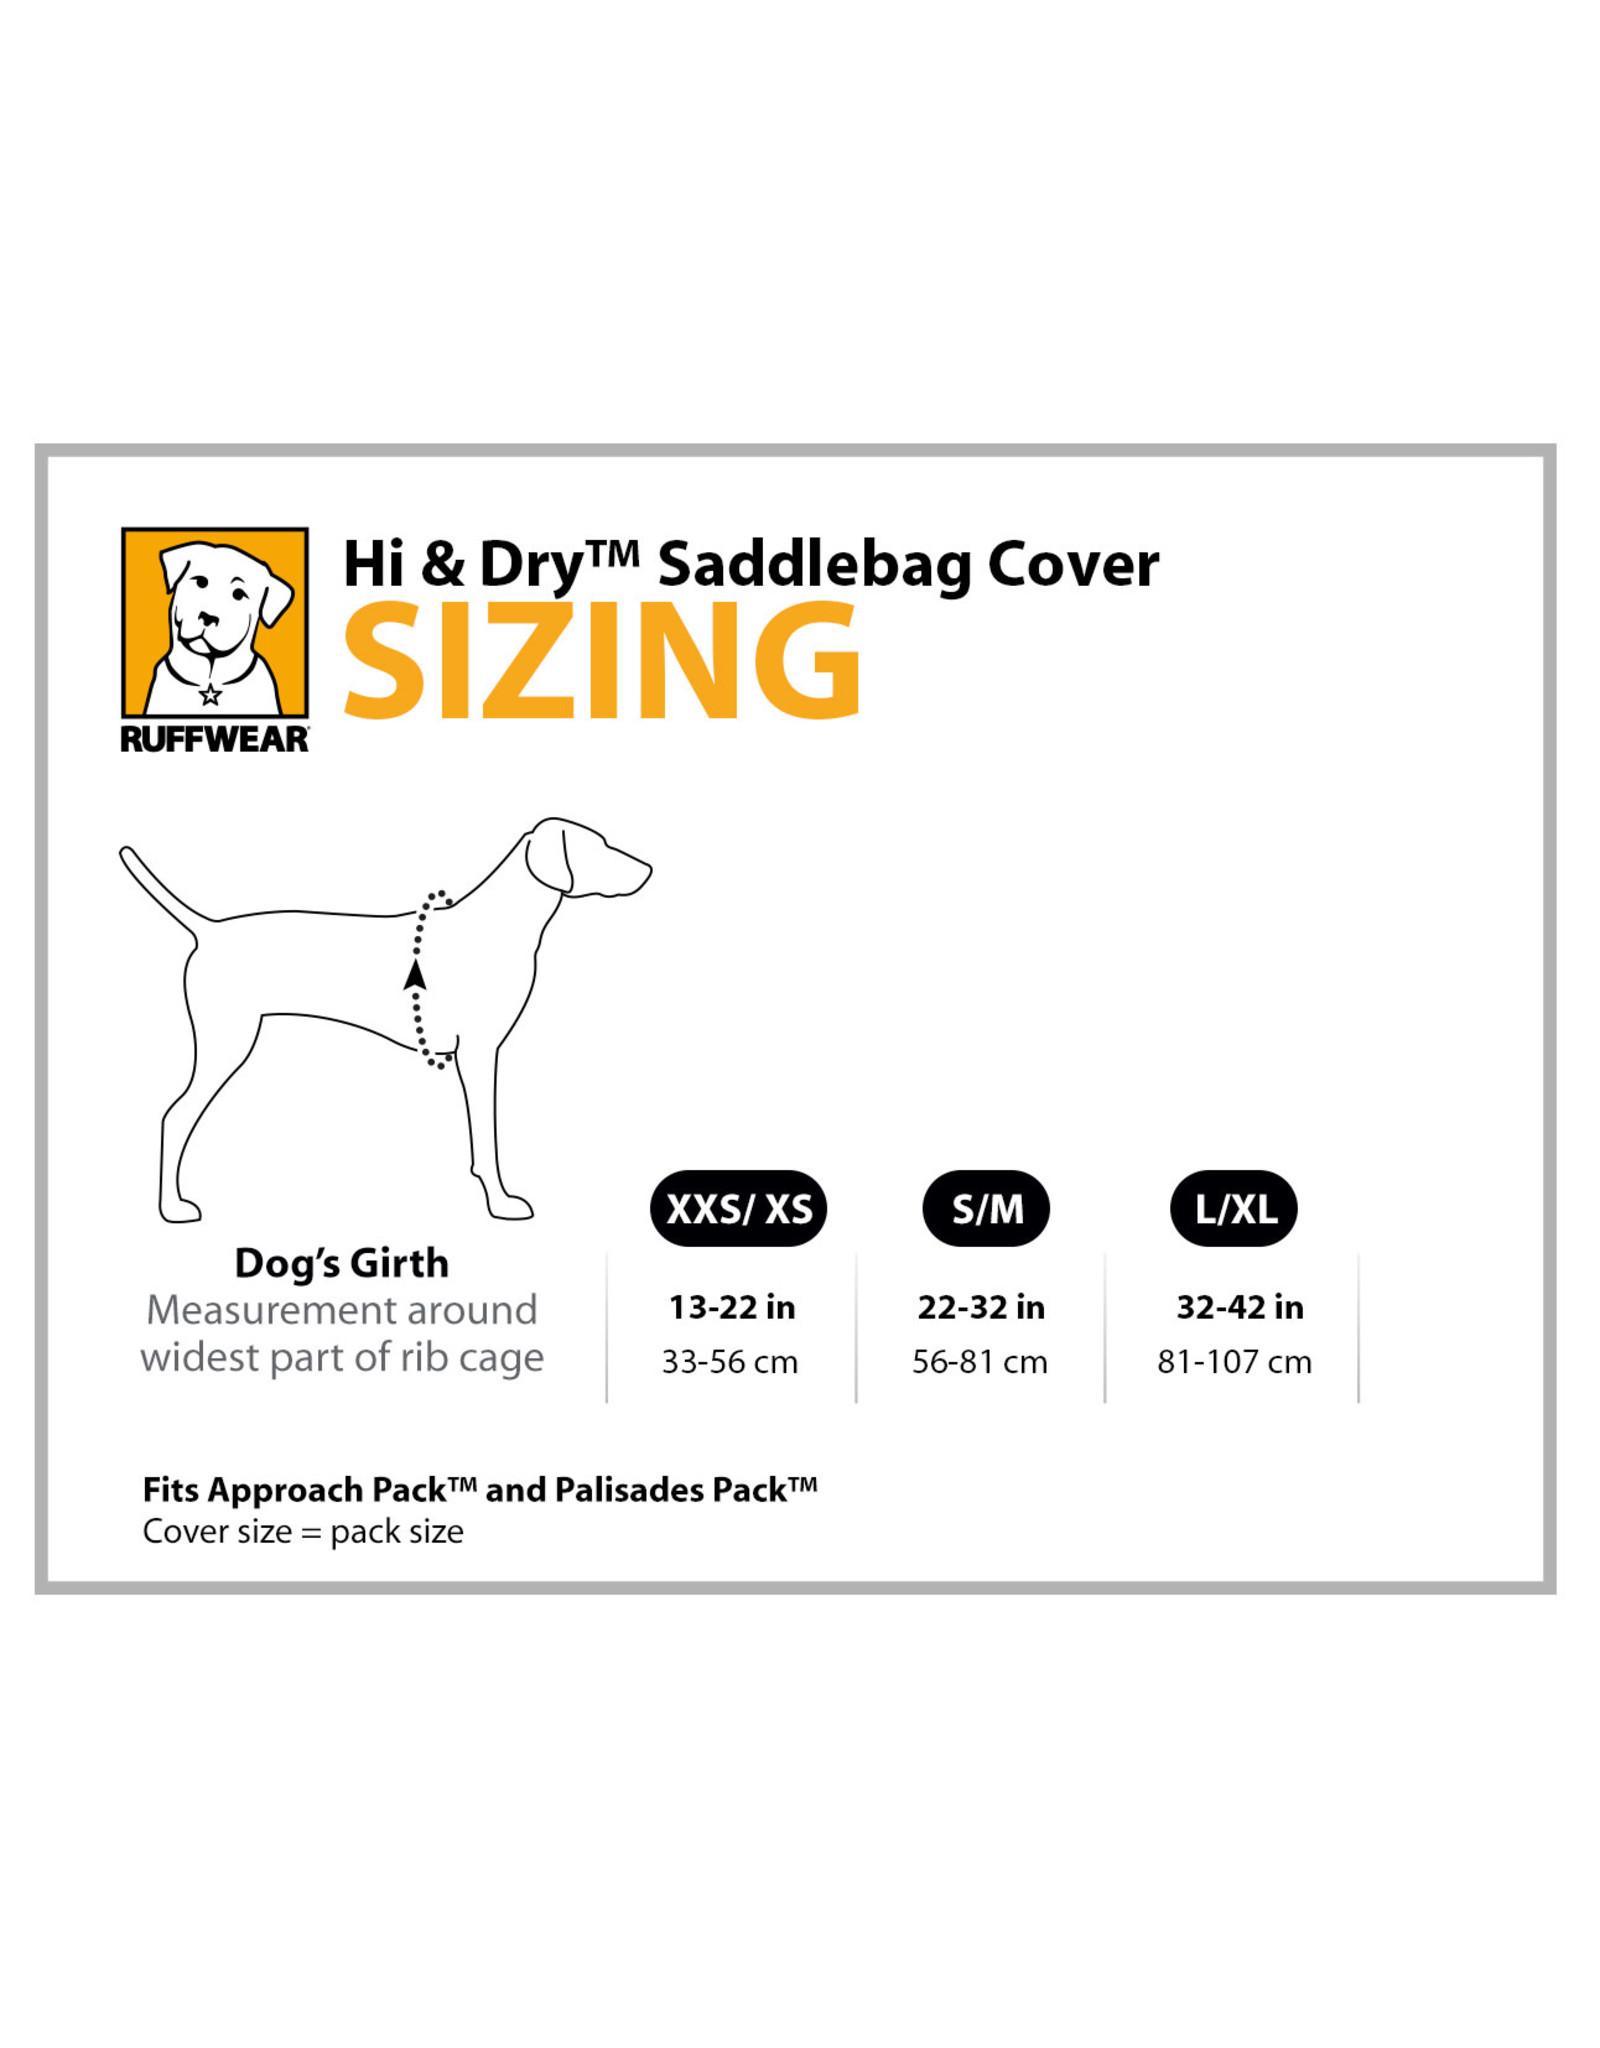 Hi & Dry Saddlebag Cover: Sunrise Yellow, S/M